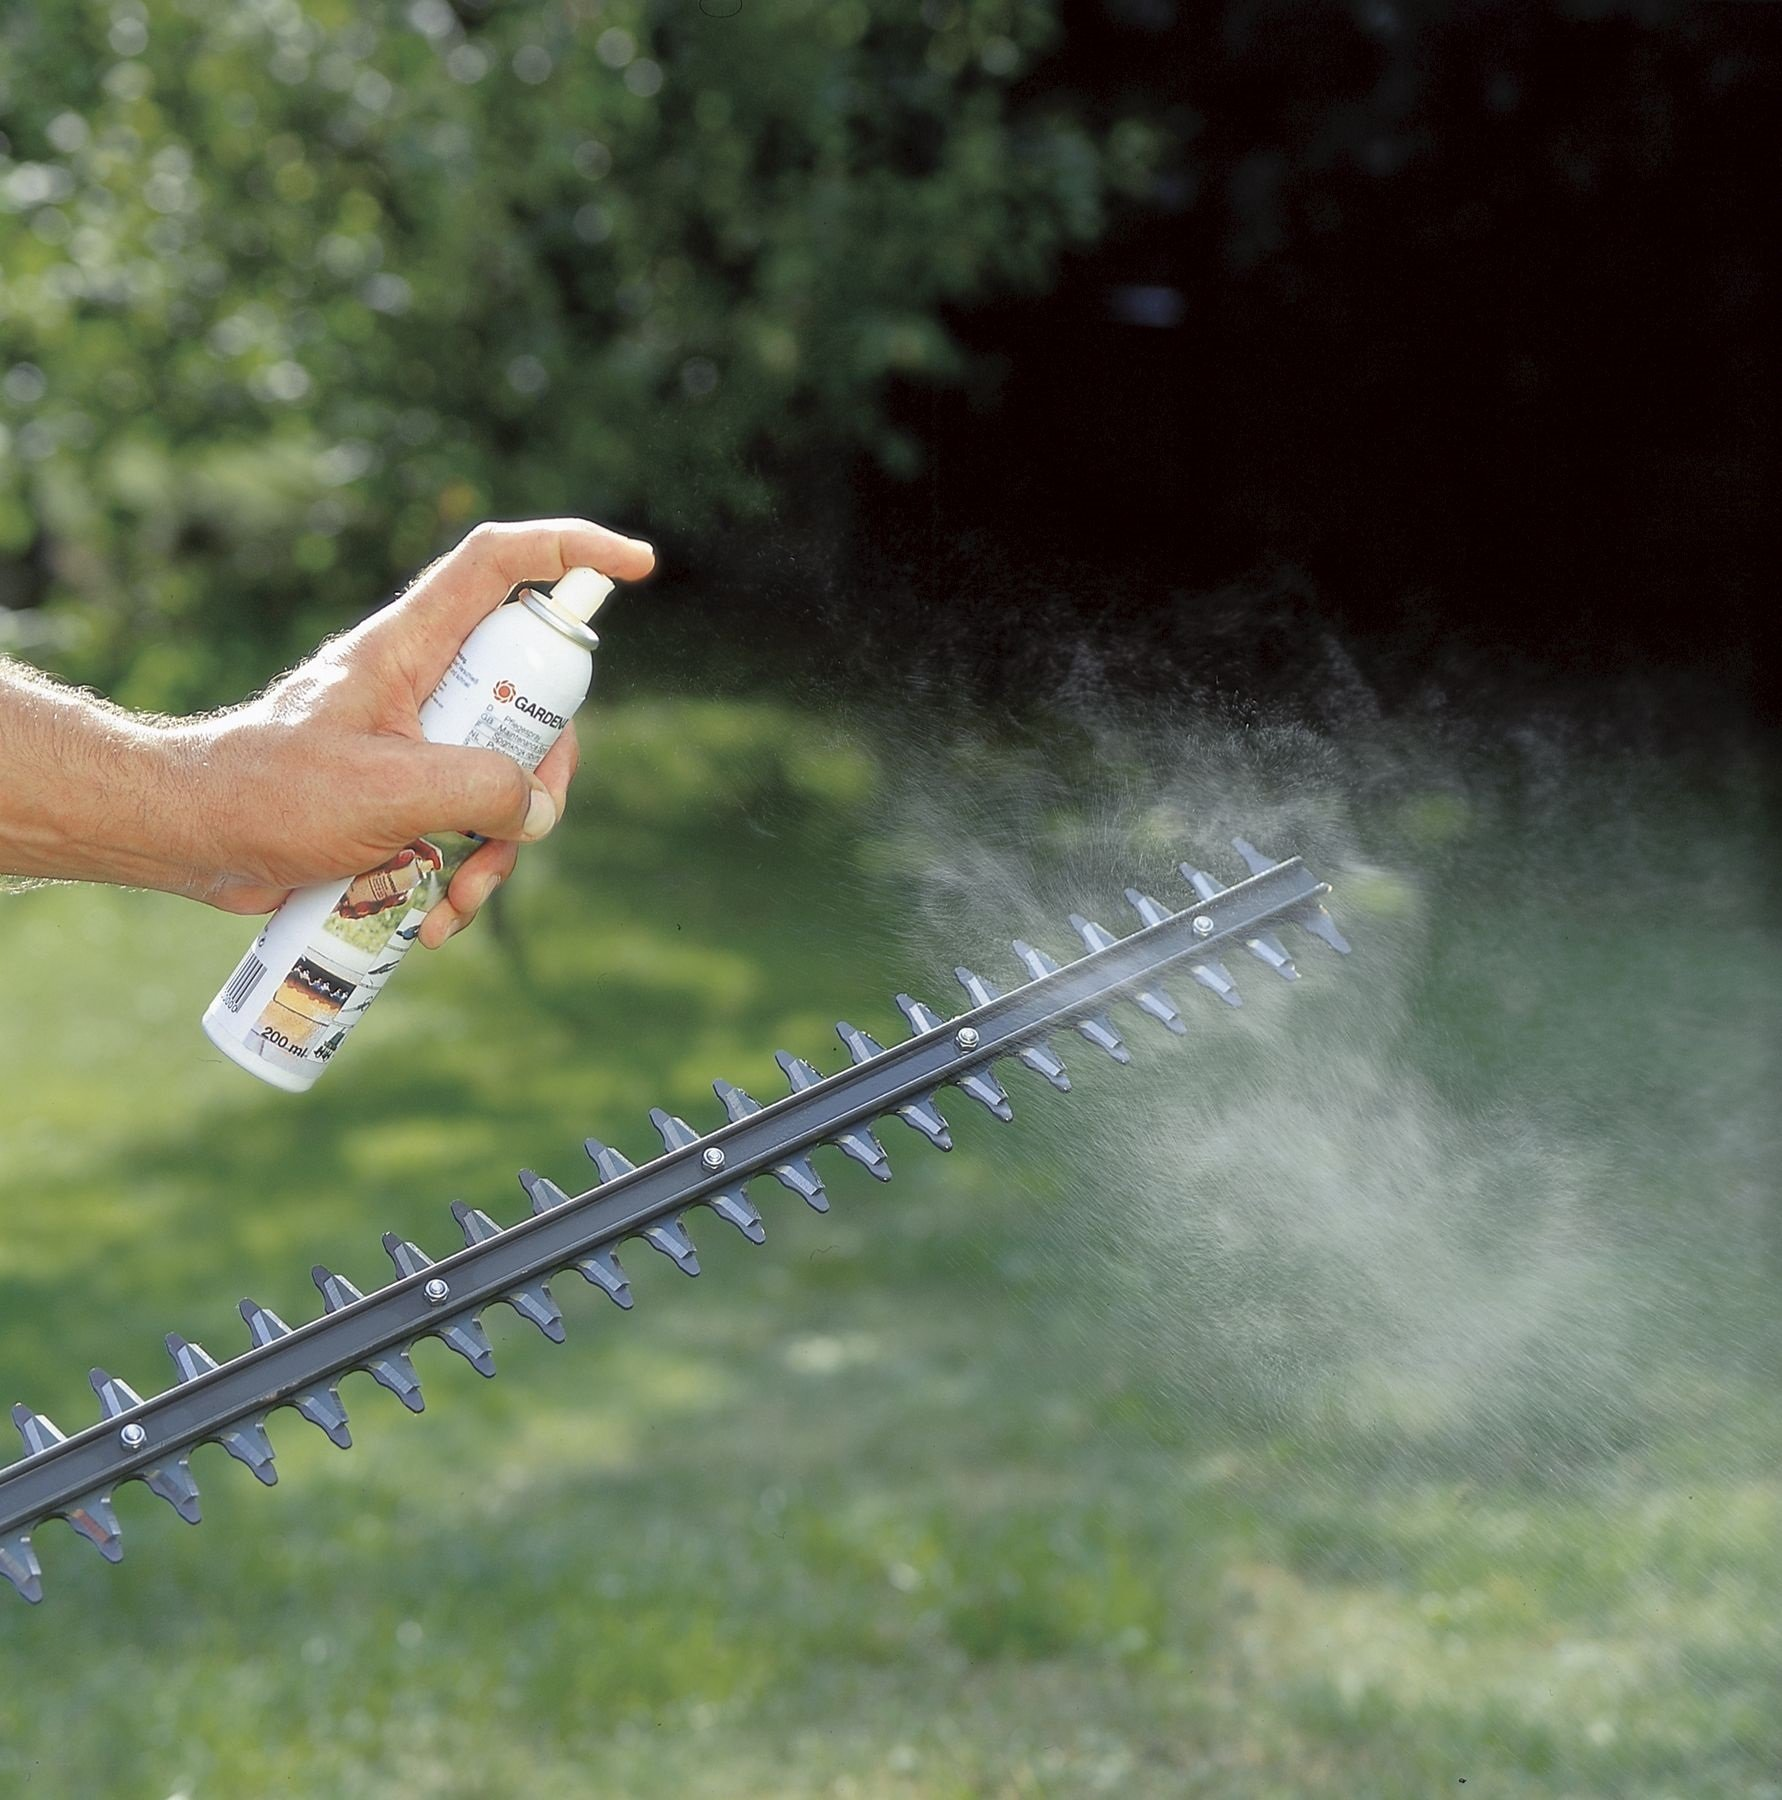 Gardena 2366-U Garden Tool Cleaning Spray, 7-Ounce